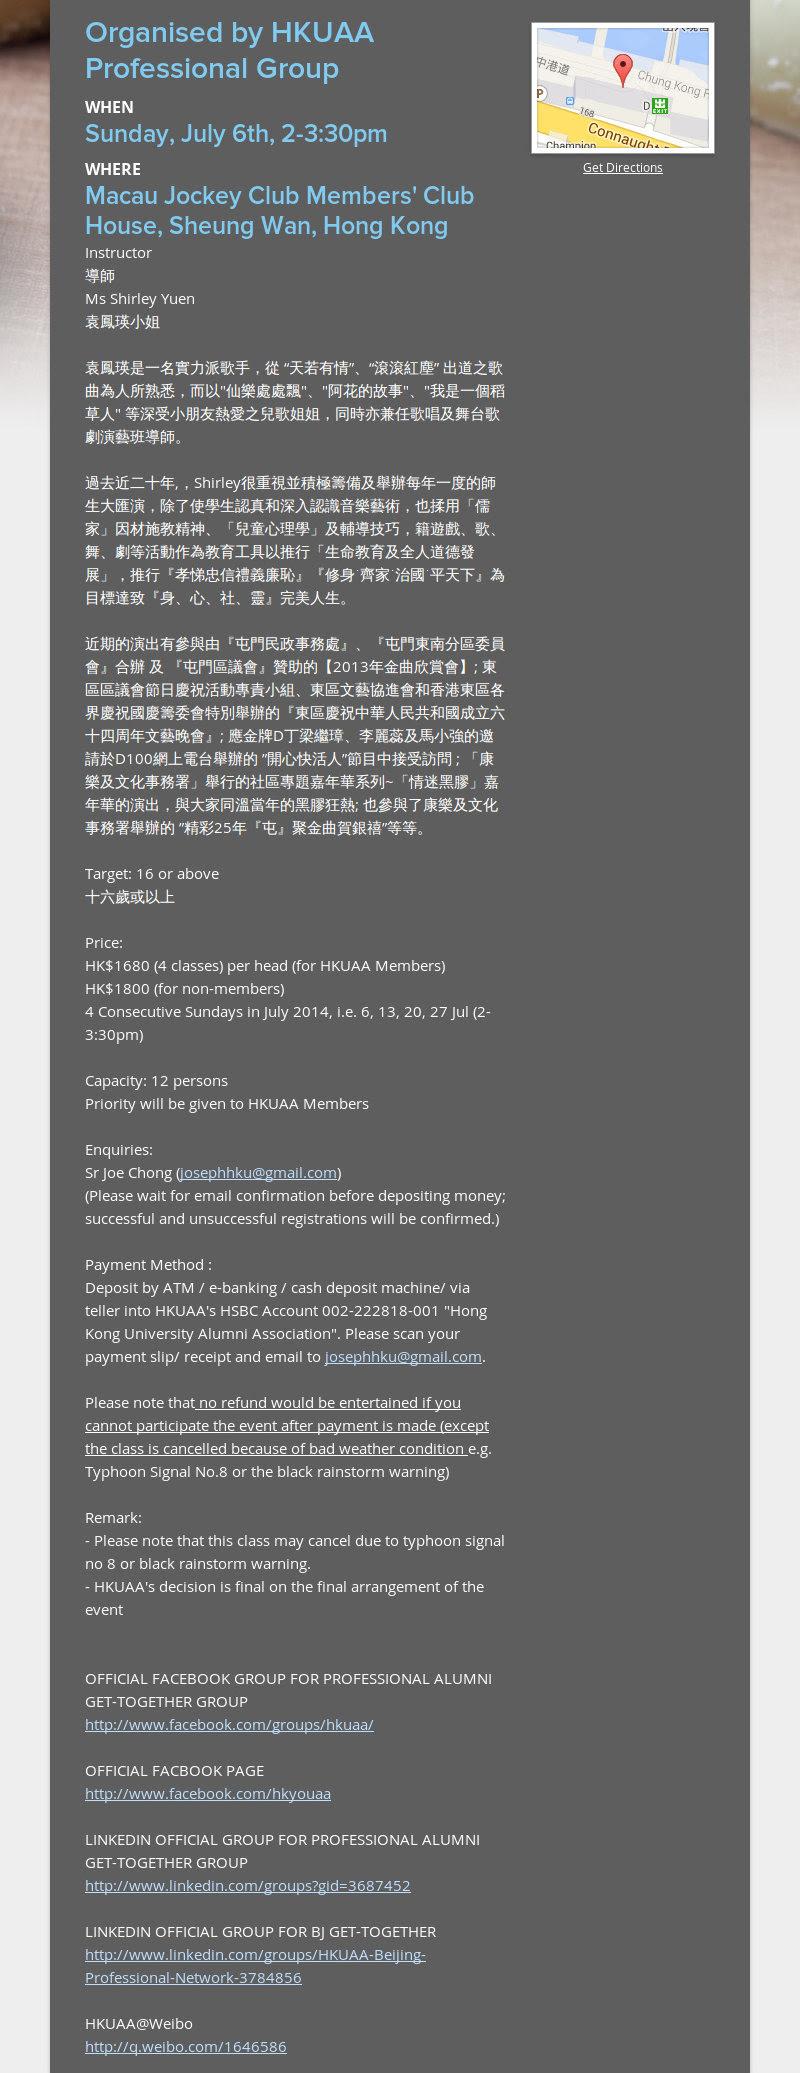 Organised by HKUAA Professional Group WHEN Sunday, July 6th, 2-3:30pm WHERE Macau Jockey Club...